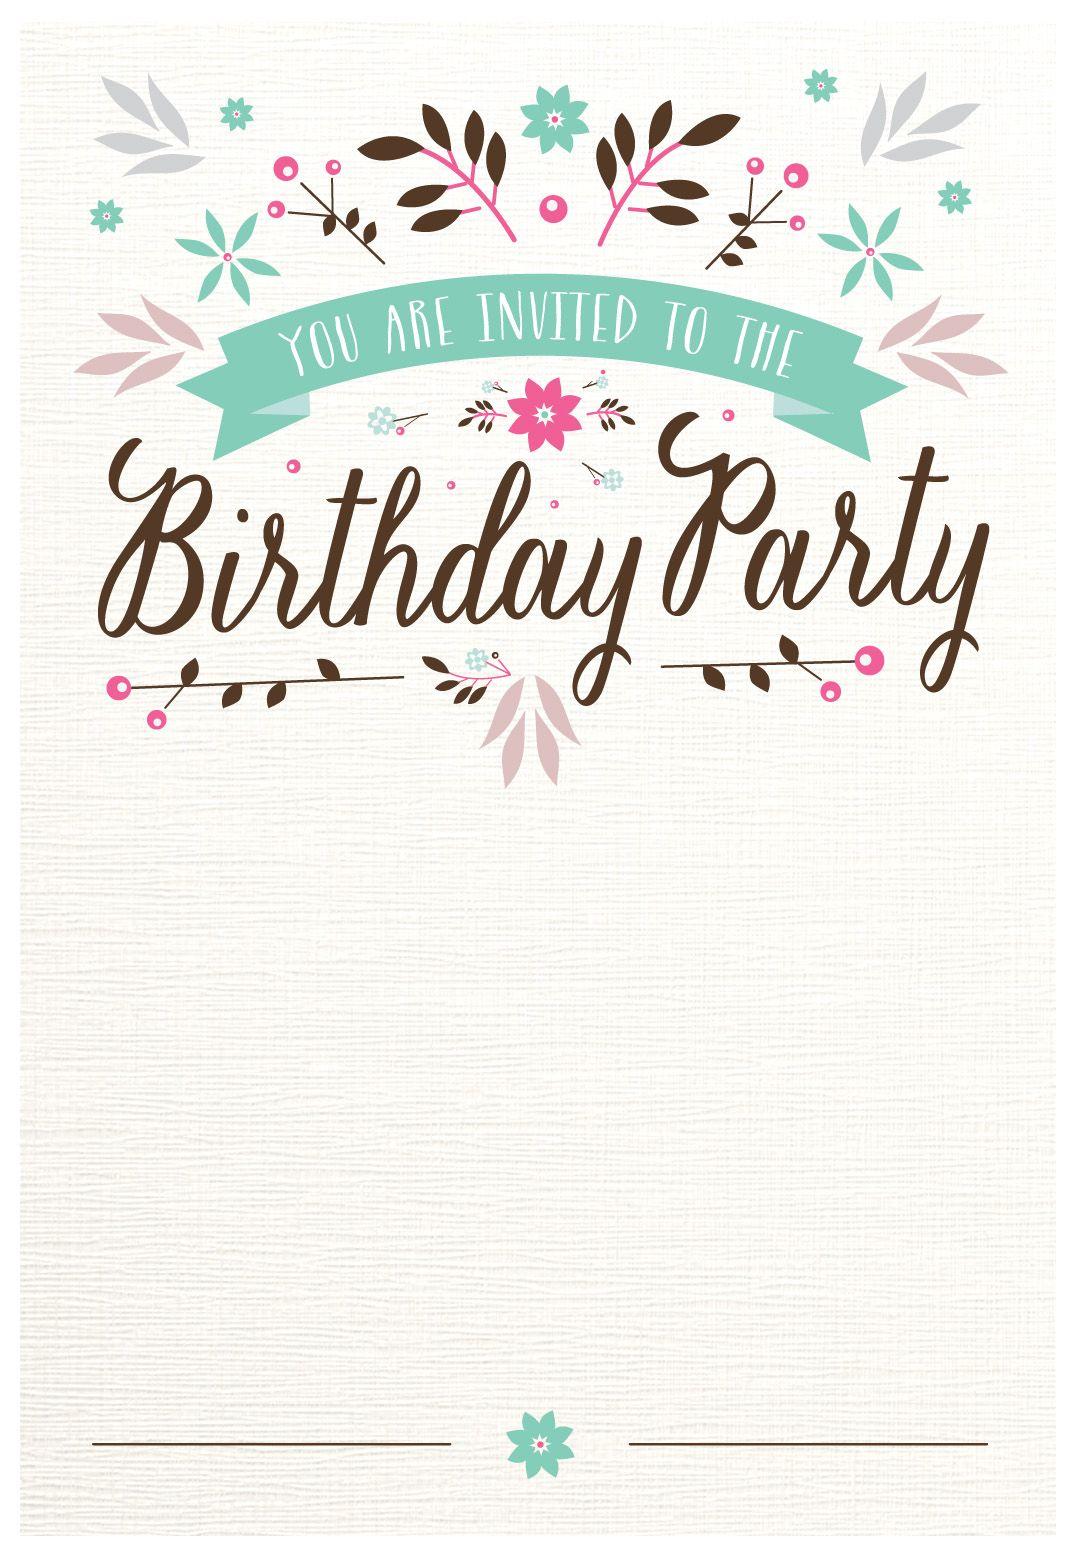 Flat Floral - Free Printable Birthday Invitation Template - 21St Birthday Invitation Templates Free Printable